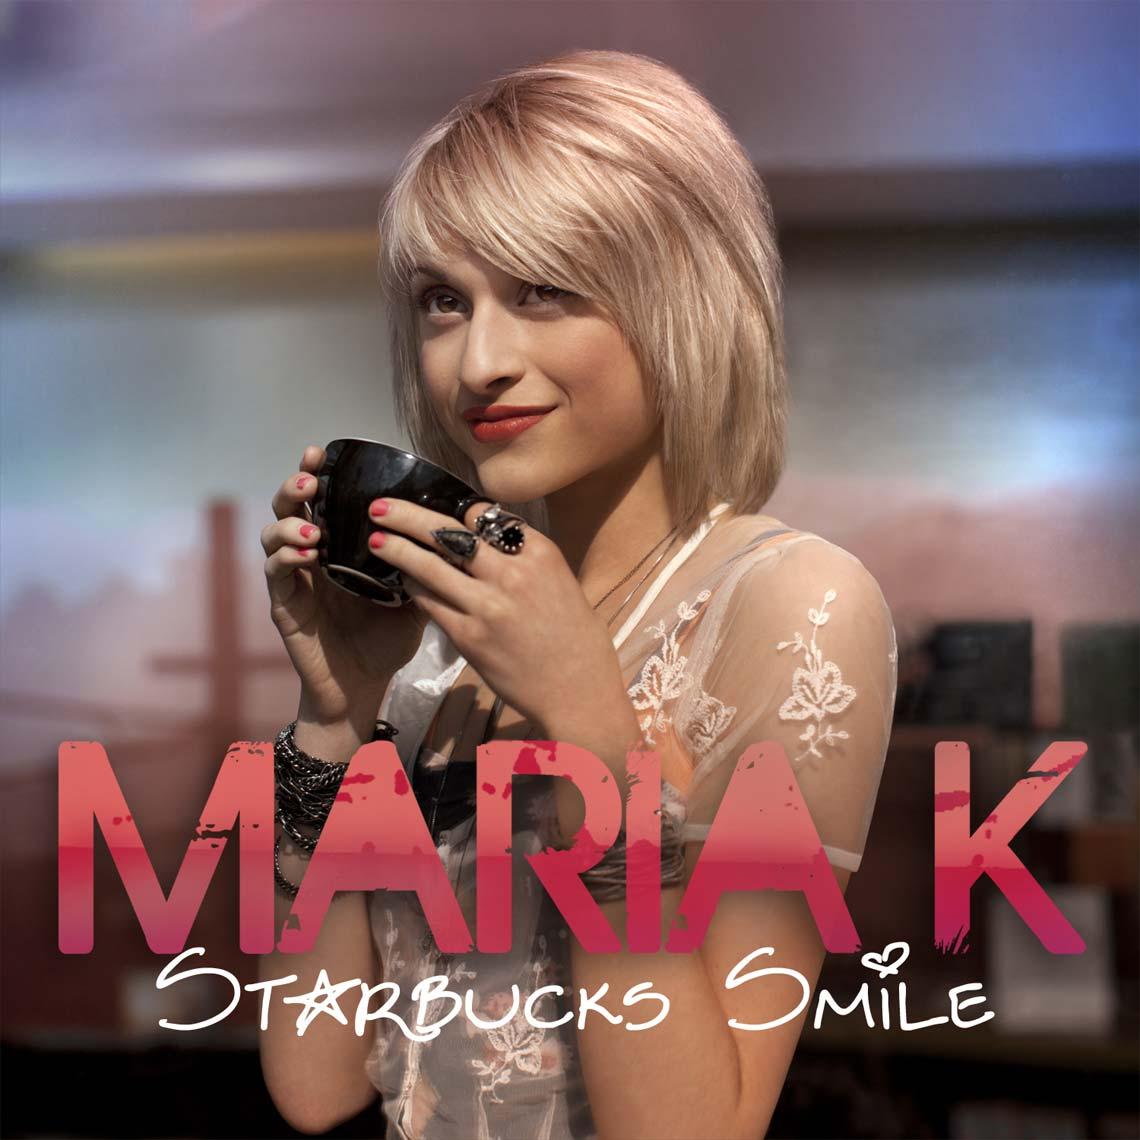 MariaK-Cover-Web.jpg